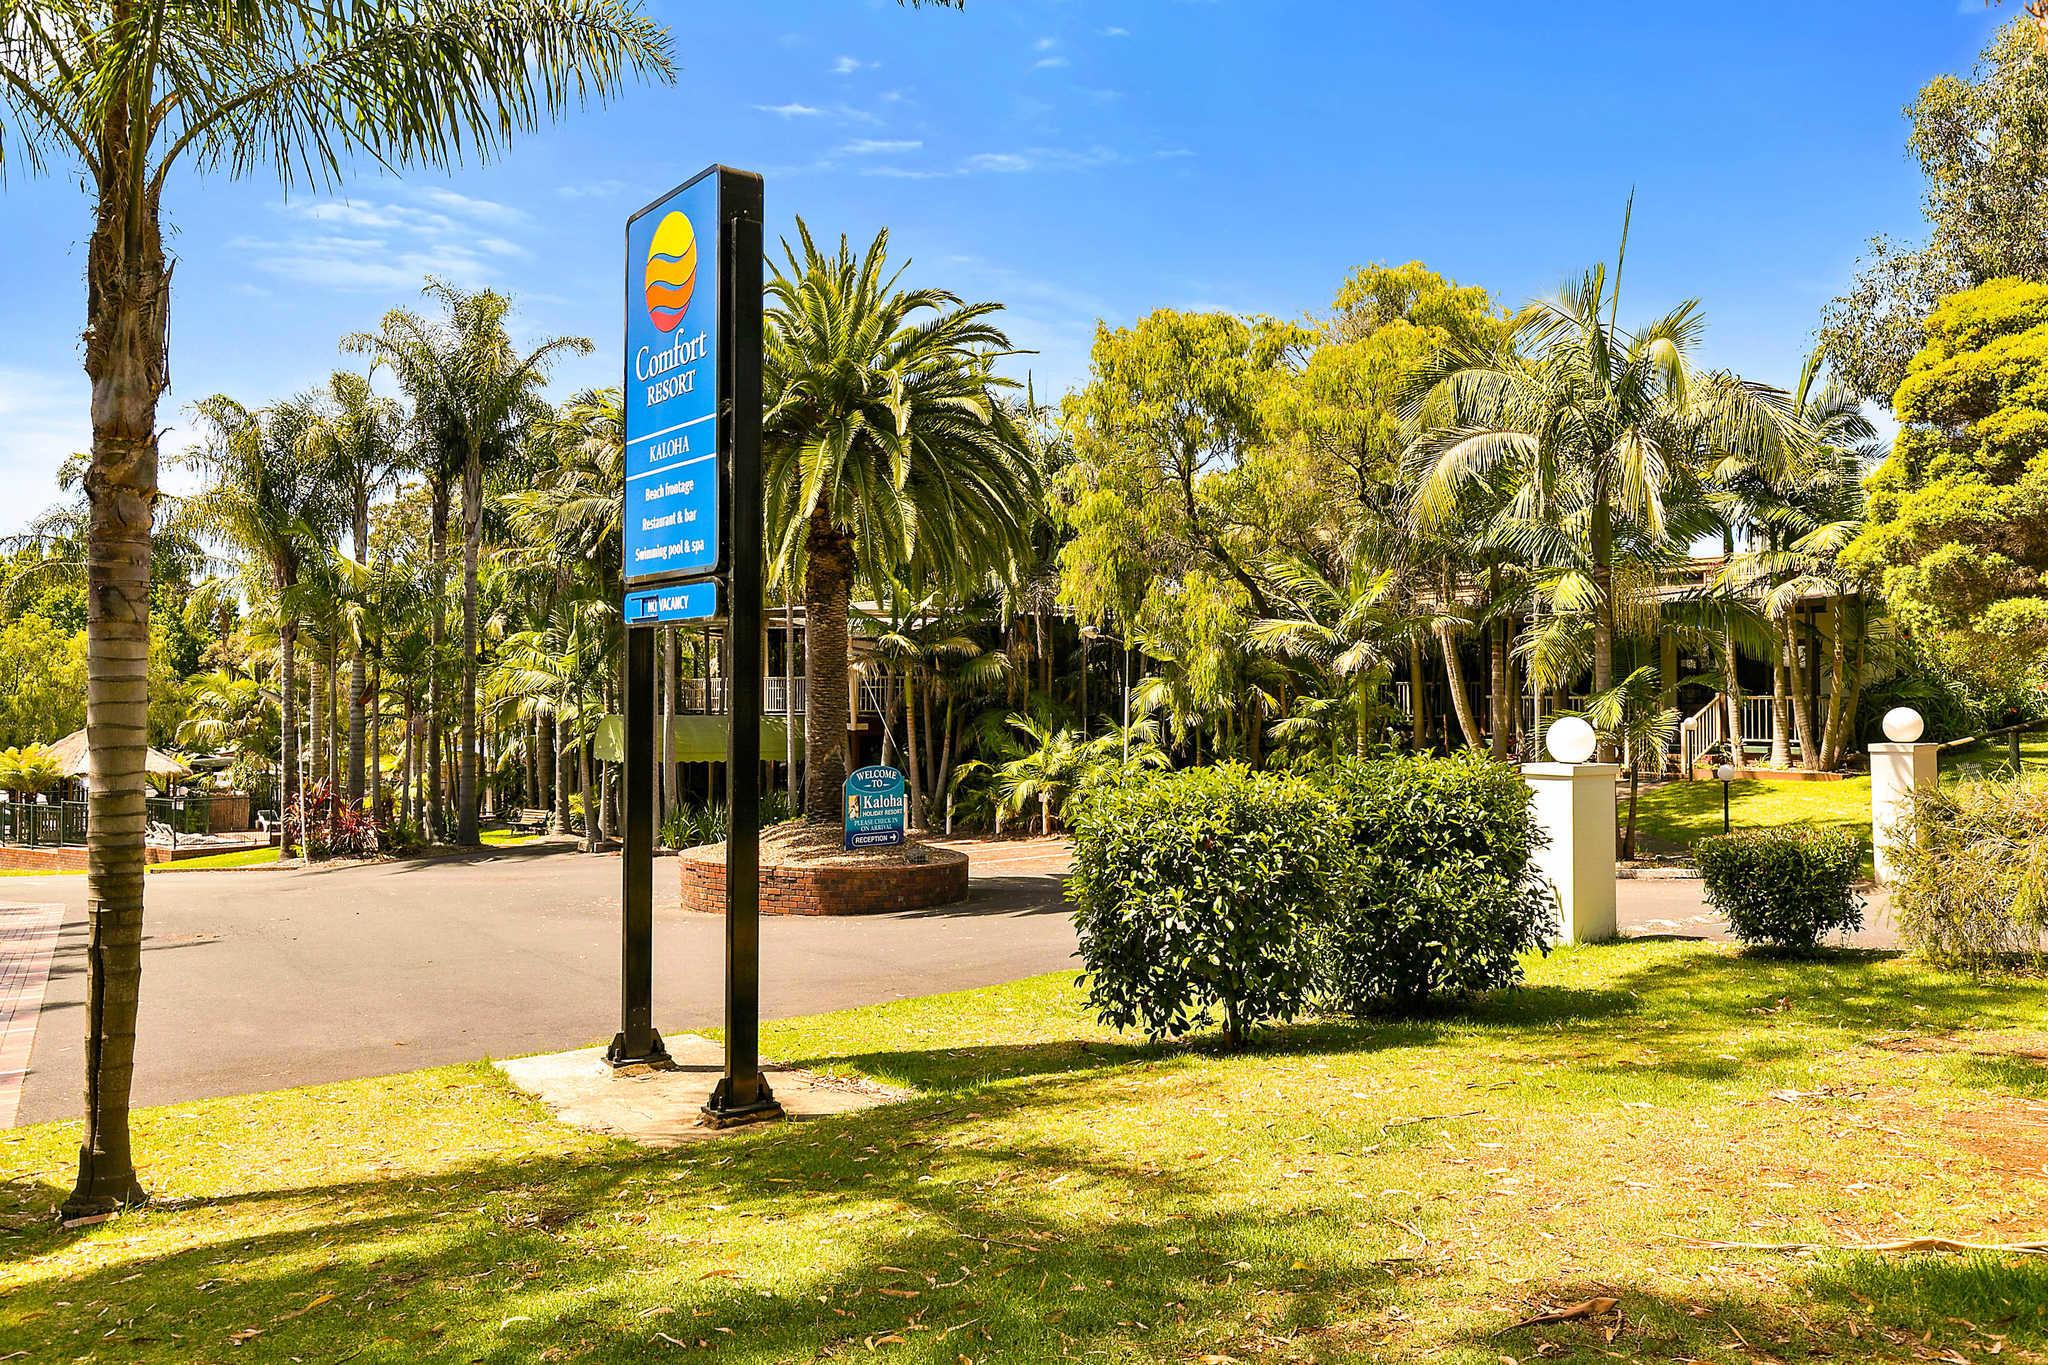 Comfort Resort Kaloha - Cowes, VIC 3922 - (03) 5952 2179 | ShowMeLocal.com